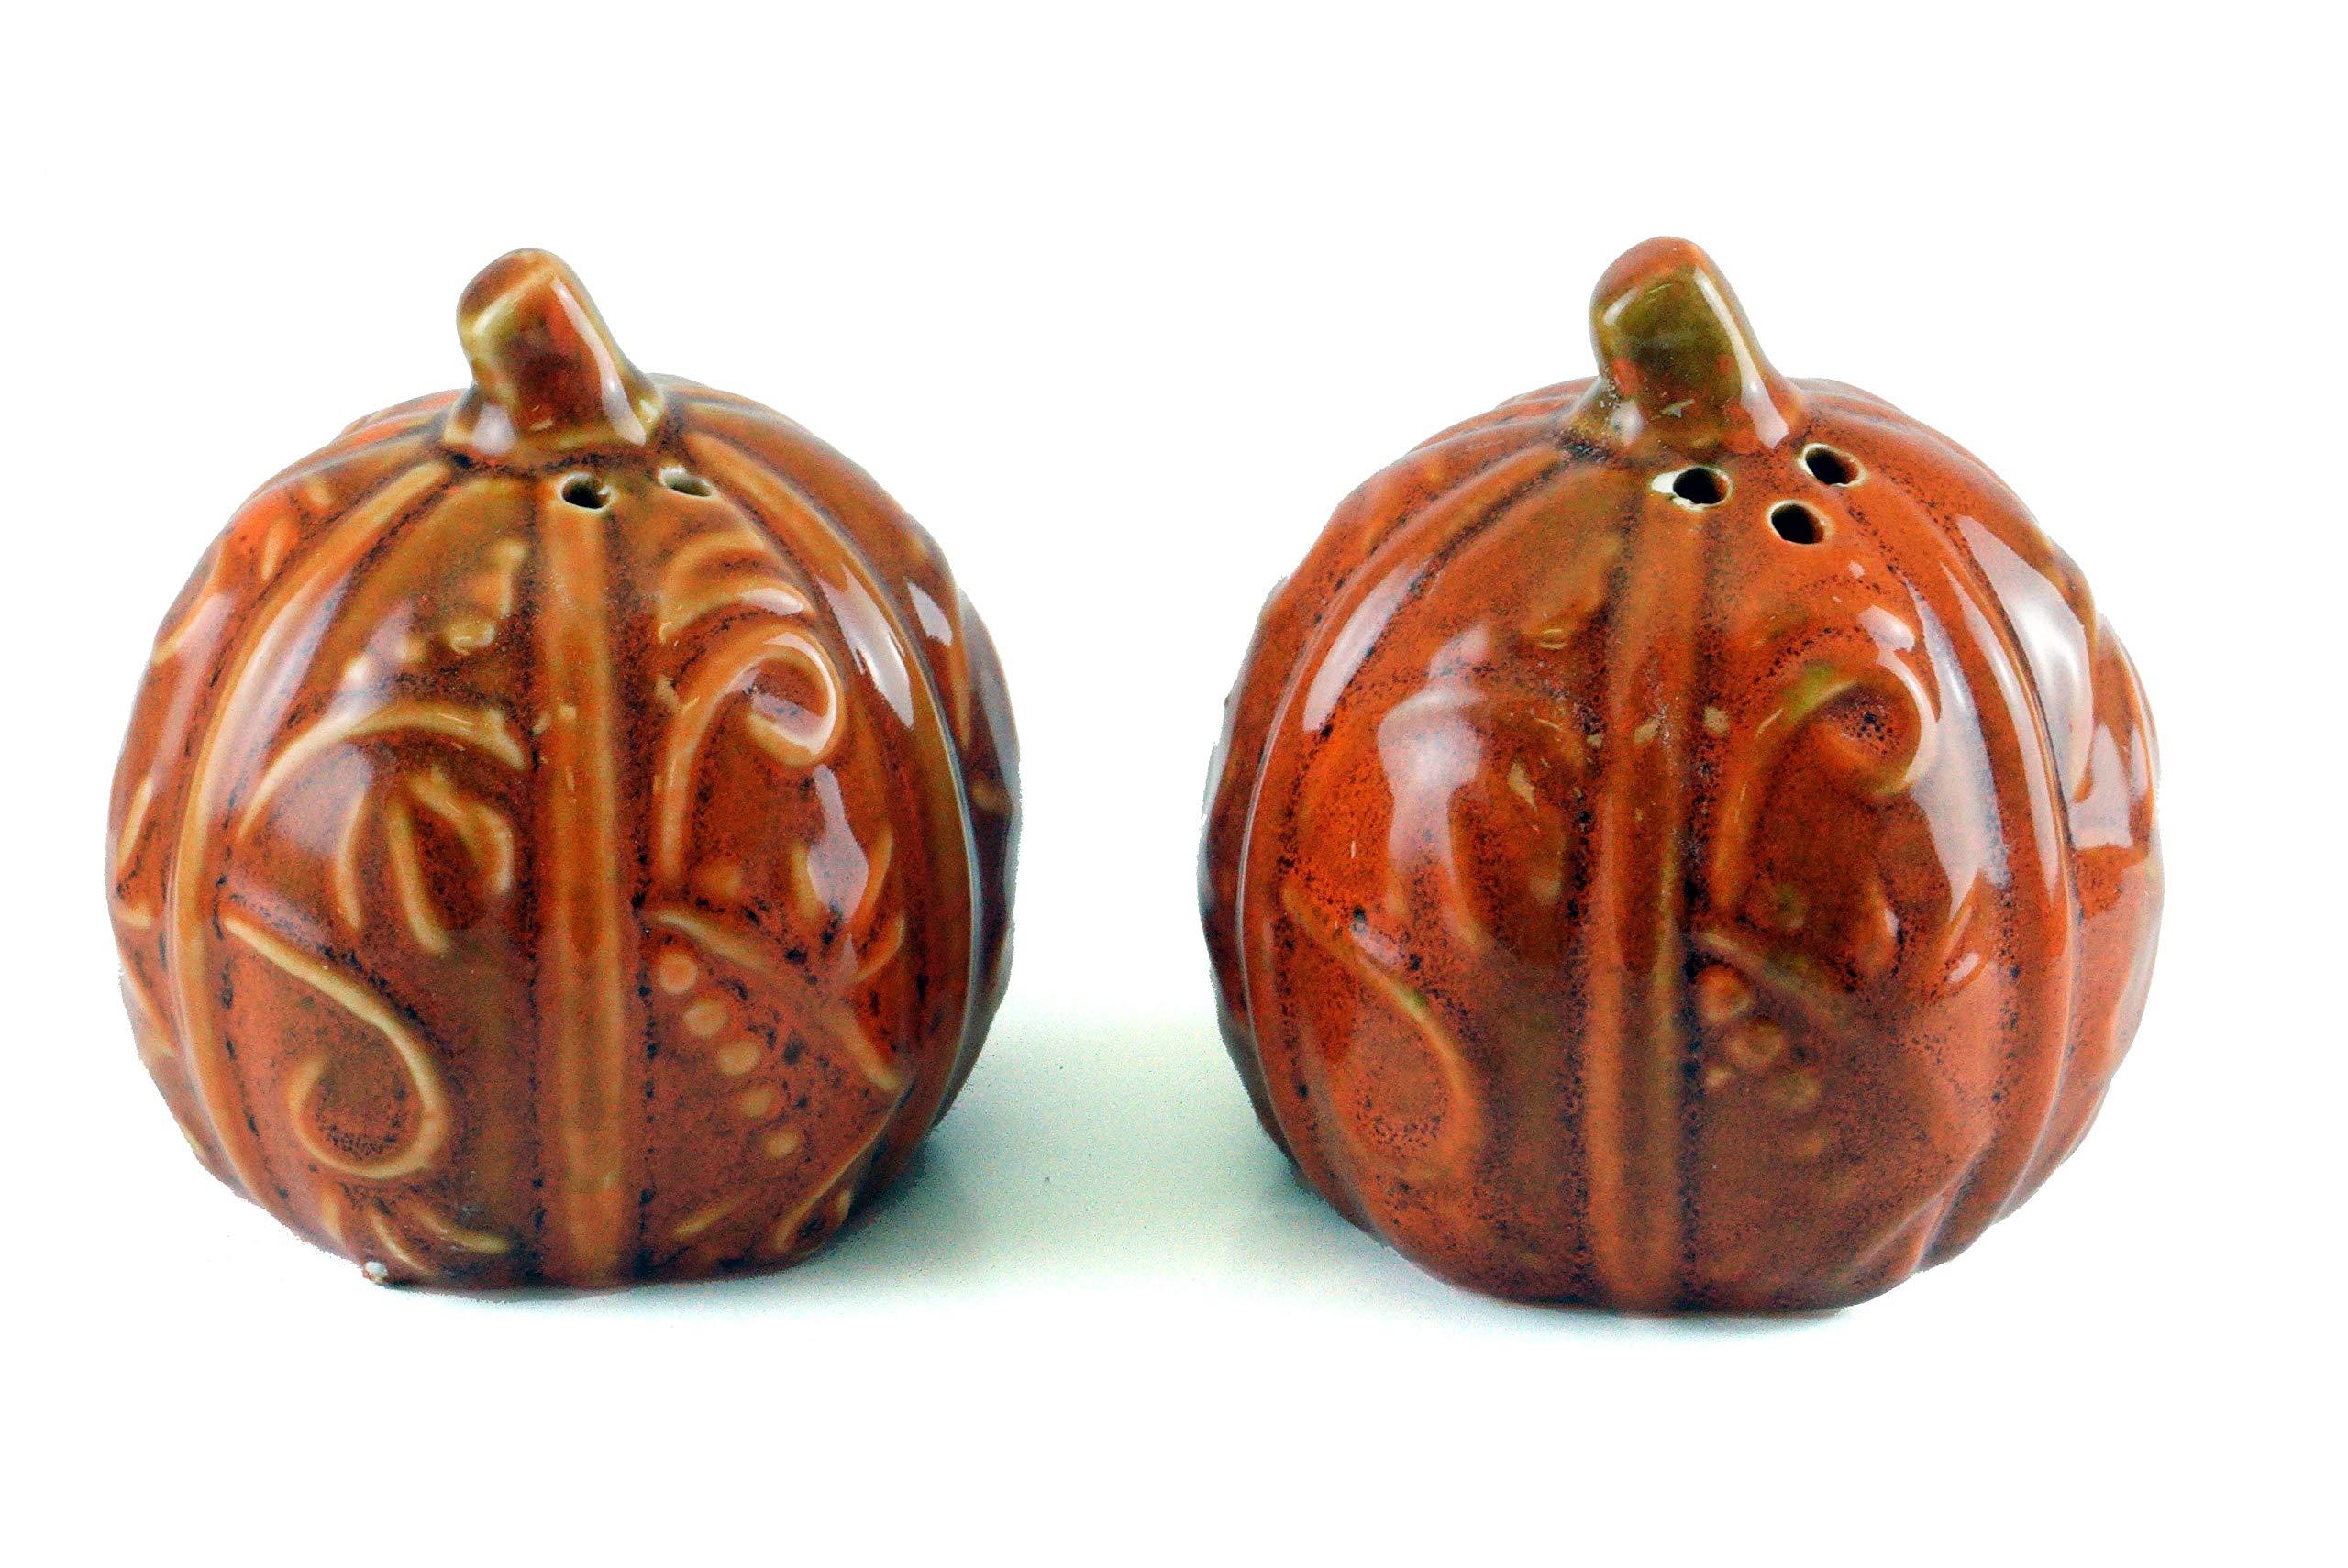 Swirled Vine Pumpkins Fall Porcelain Salt & Pepper Shakers by Gerson